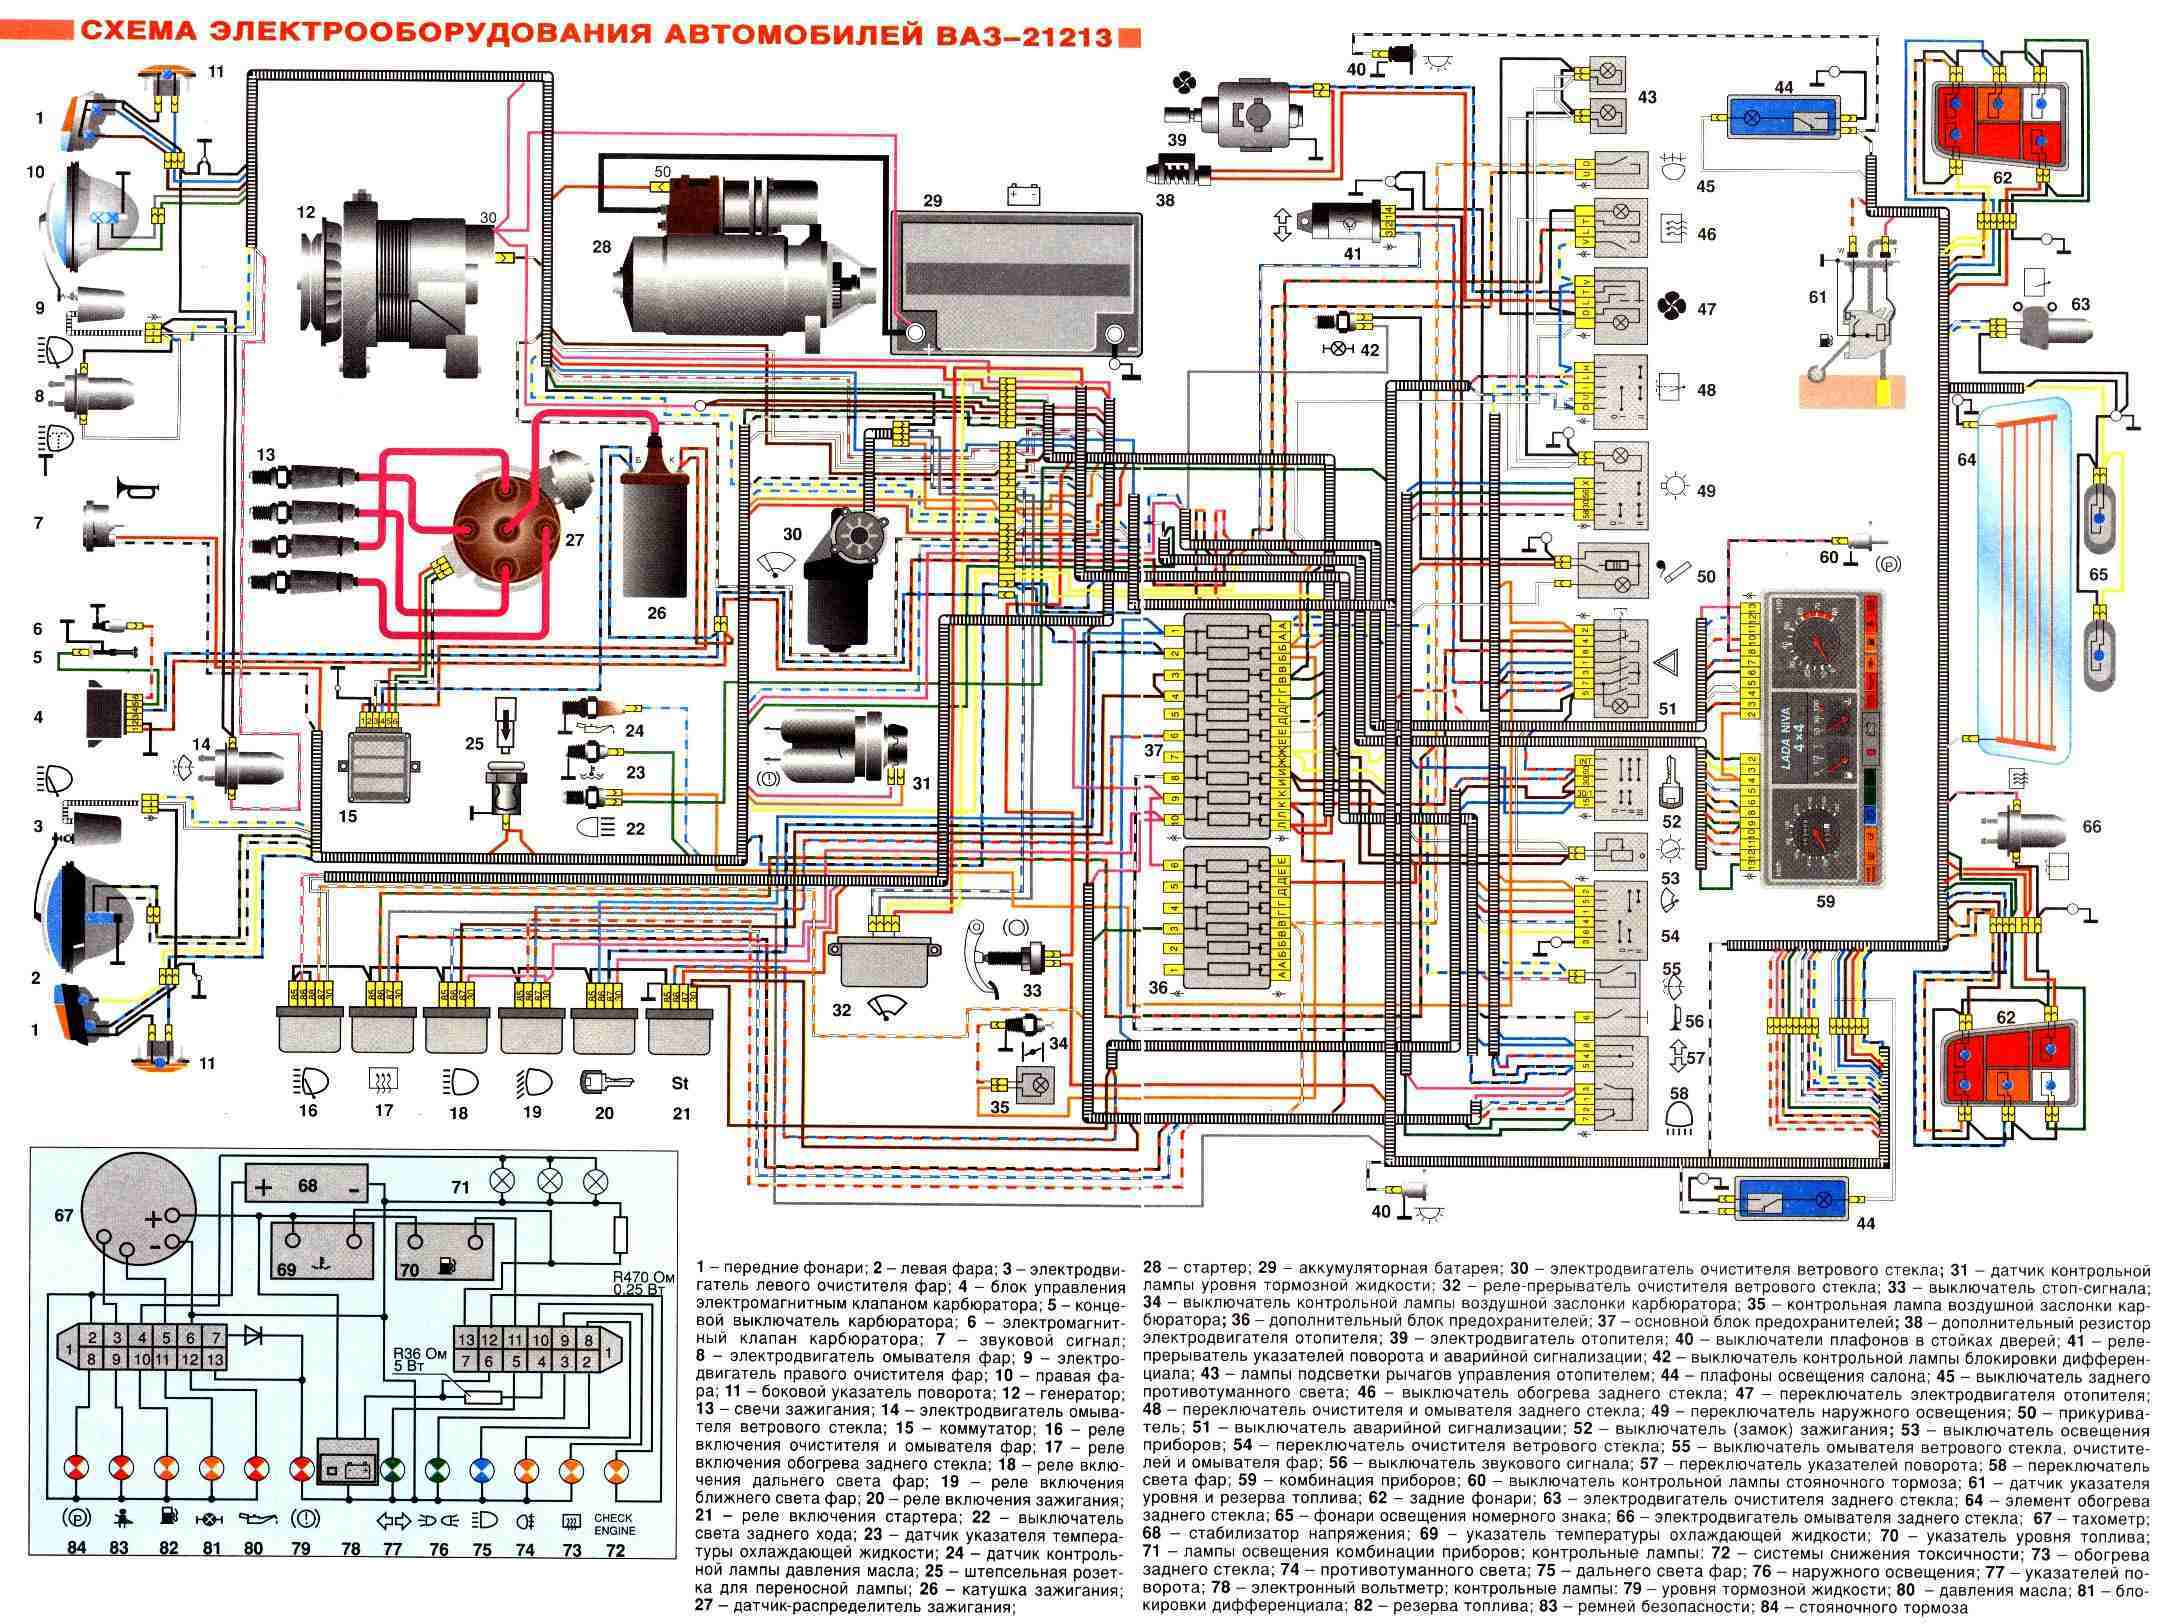 Ваз 21213 схема и описание